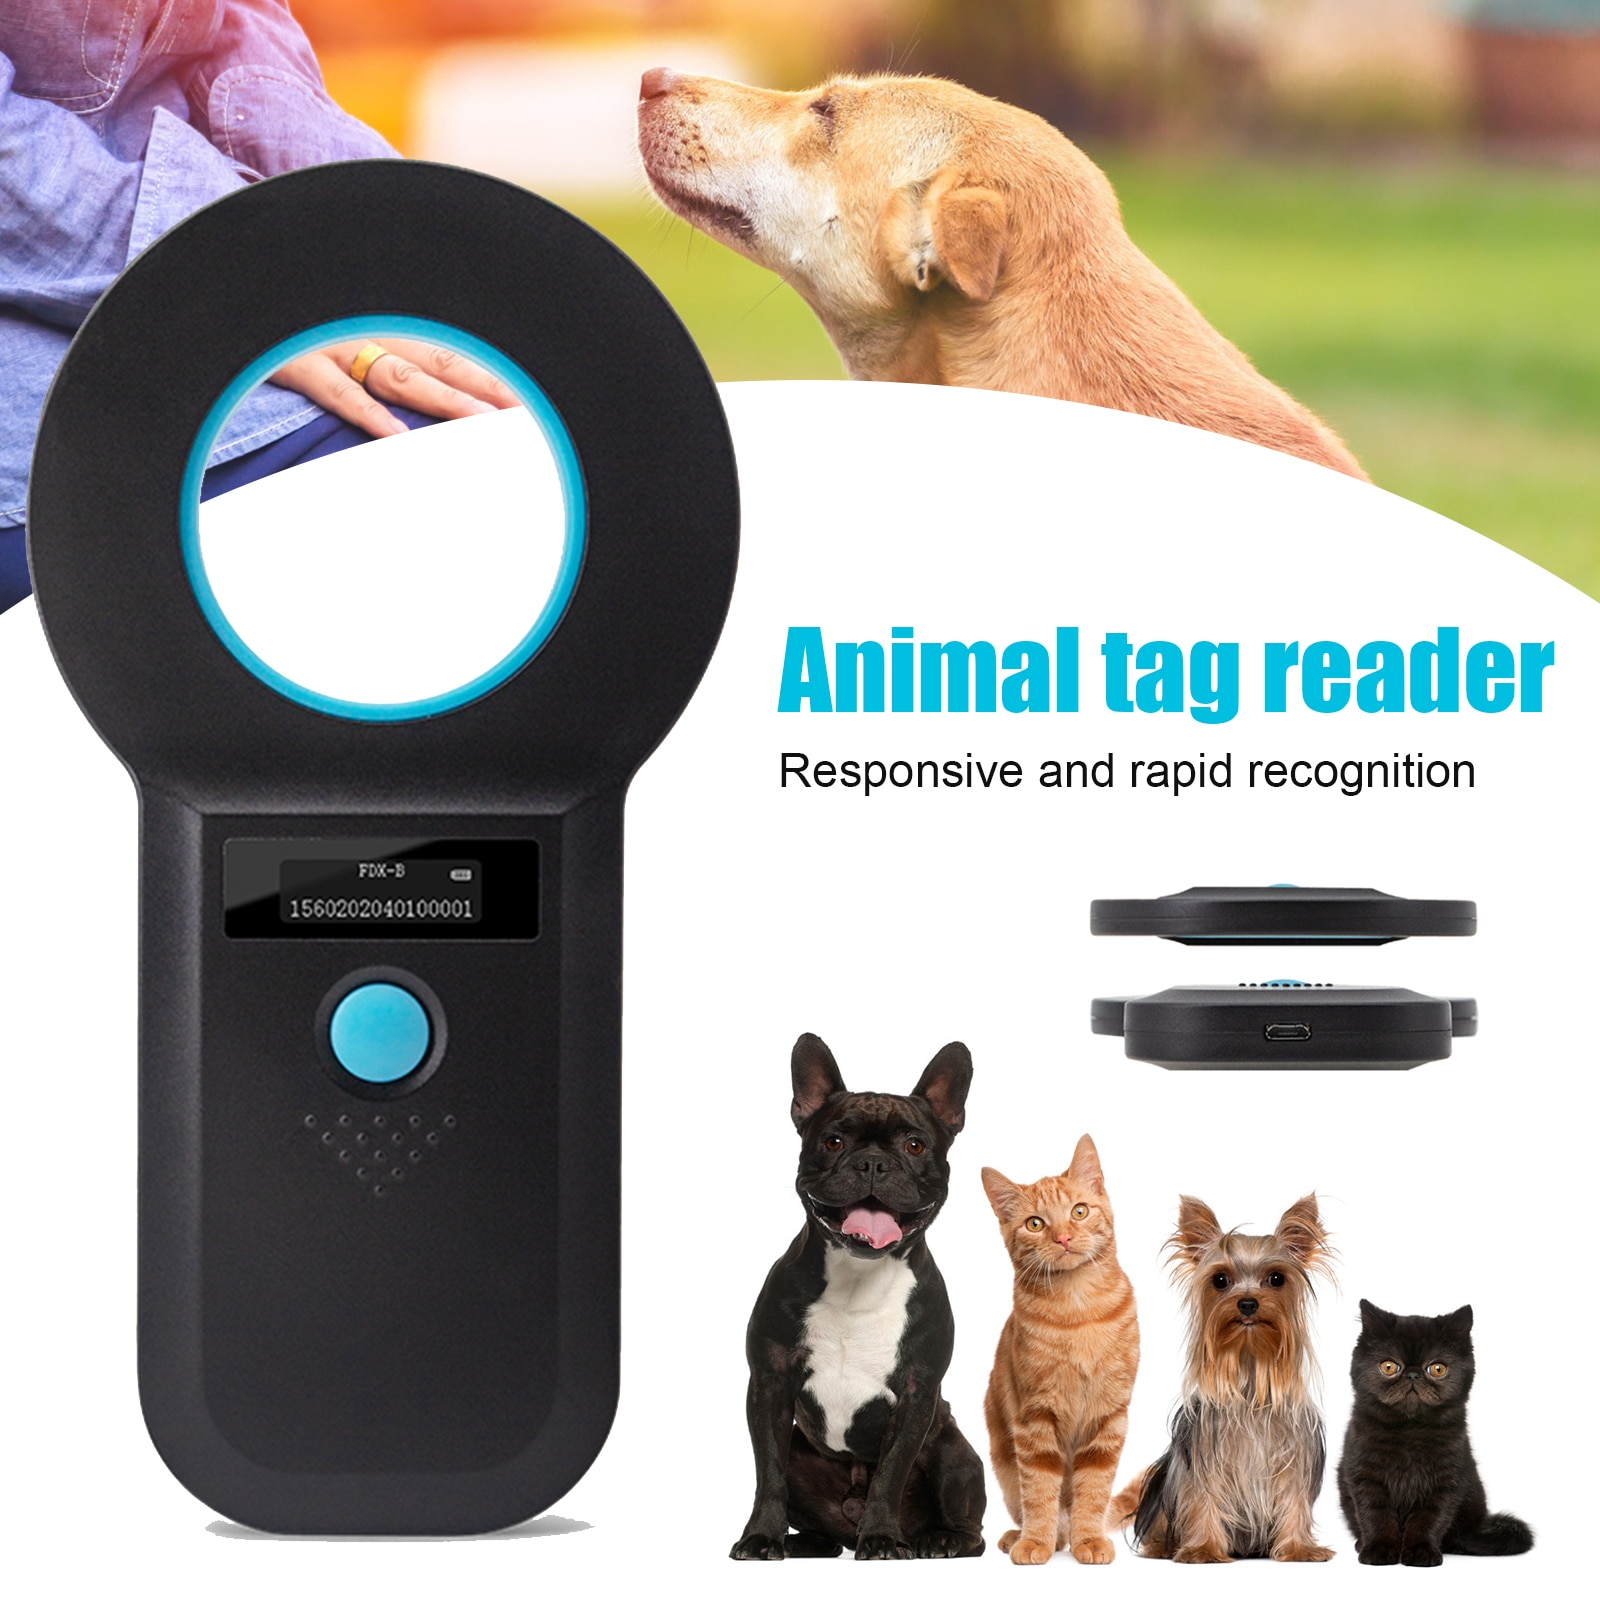 EMID ISO-قارئ علامة الحيوانات الأليفة ، الماسح الضوئي OLED للعلامة TN99 ، رقاقة محمولة للقطط والكلاب